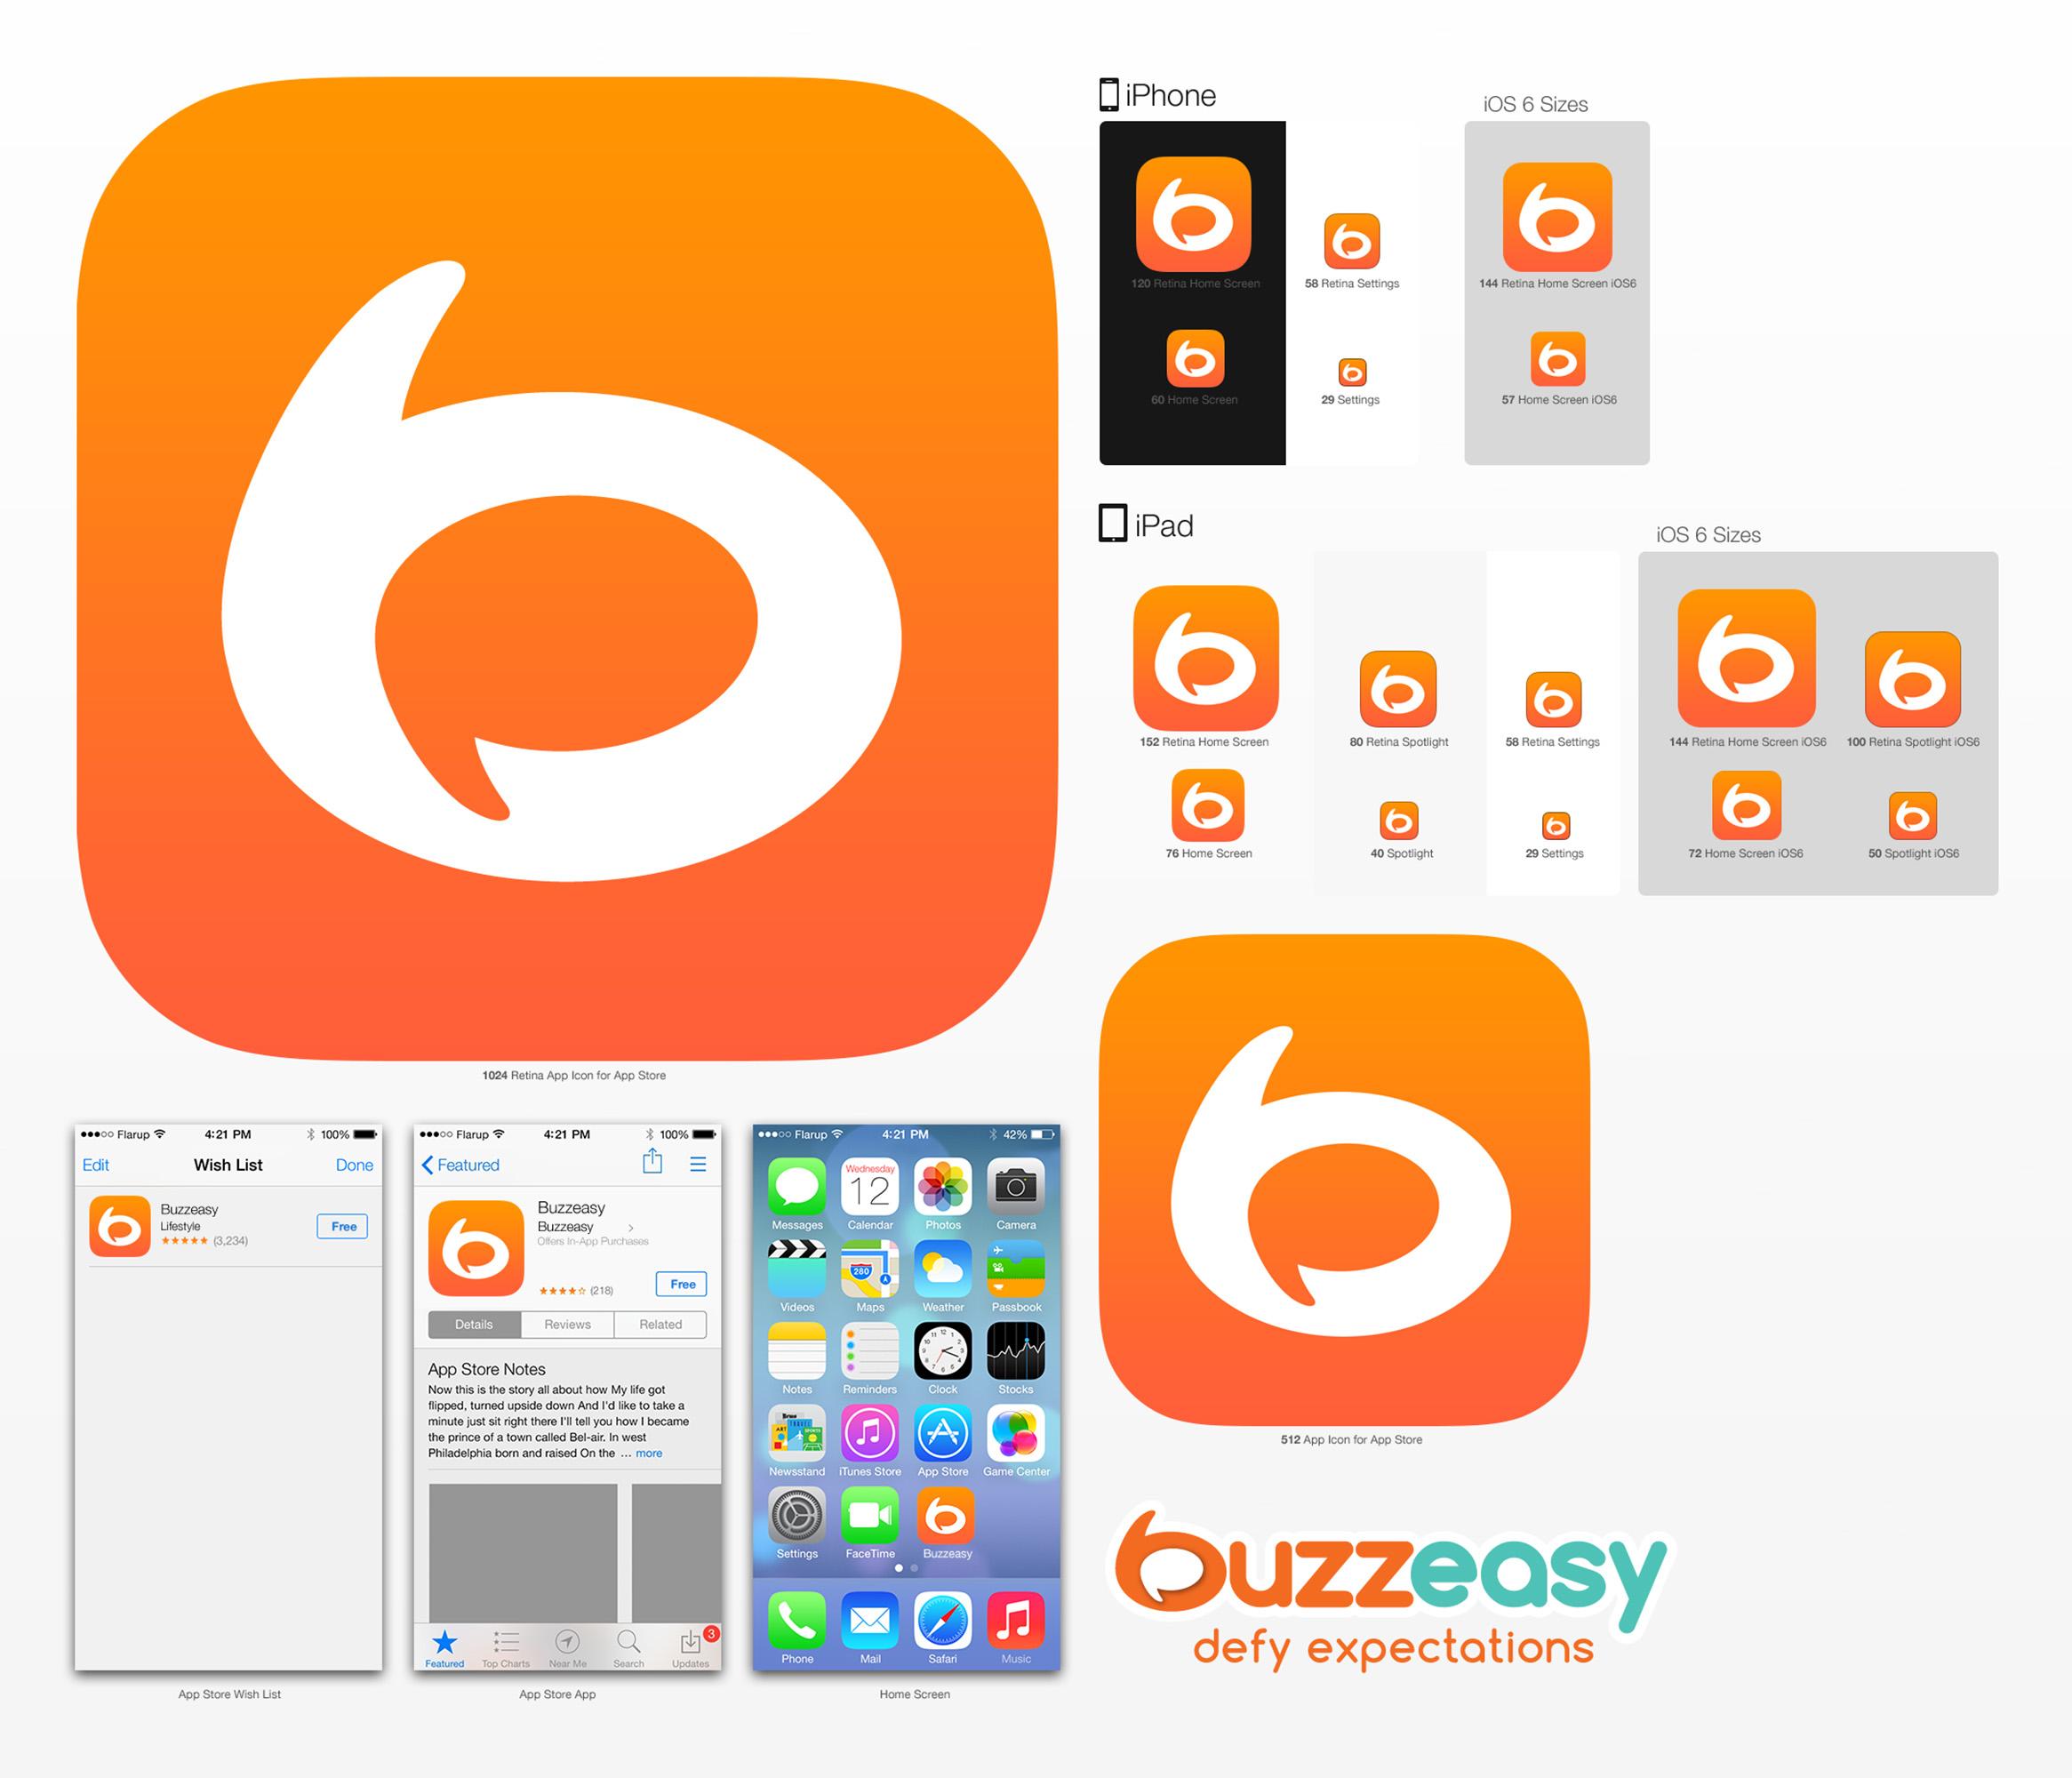 Buzzeasy brand assets app design